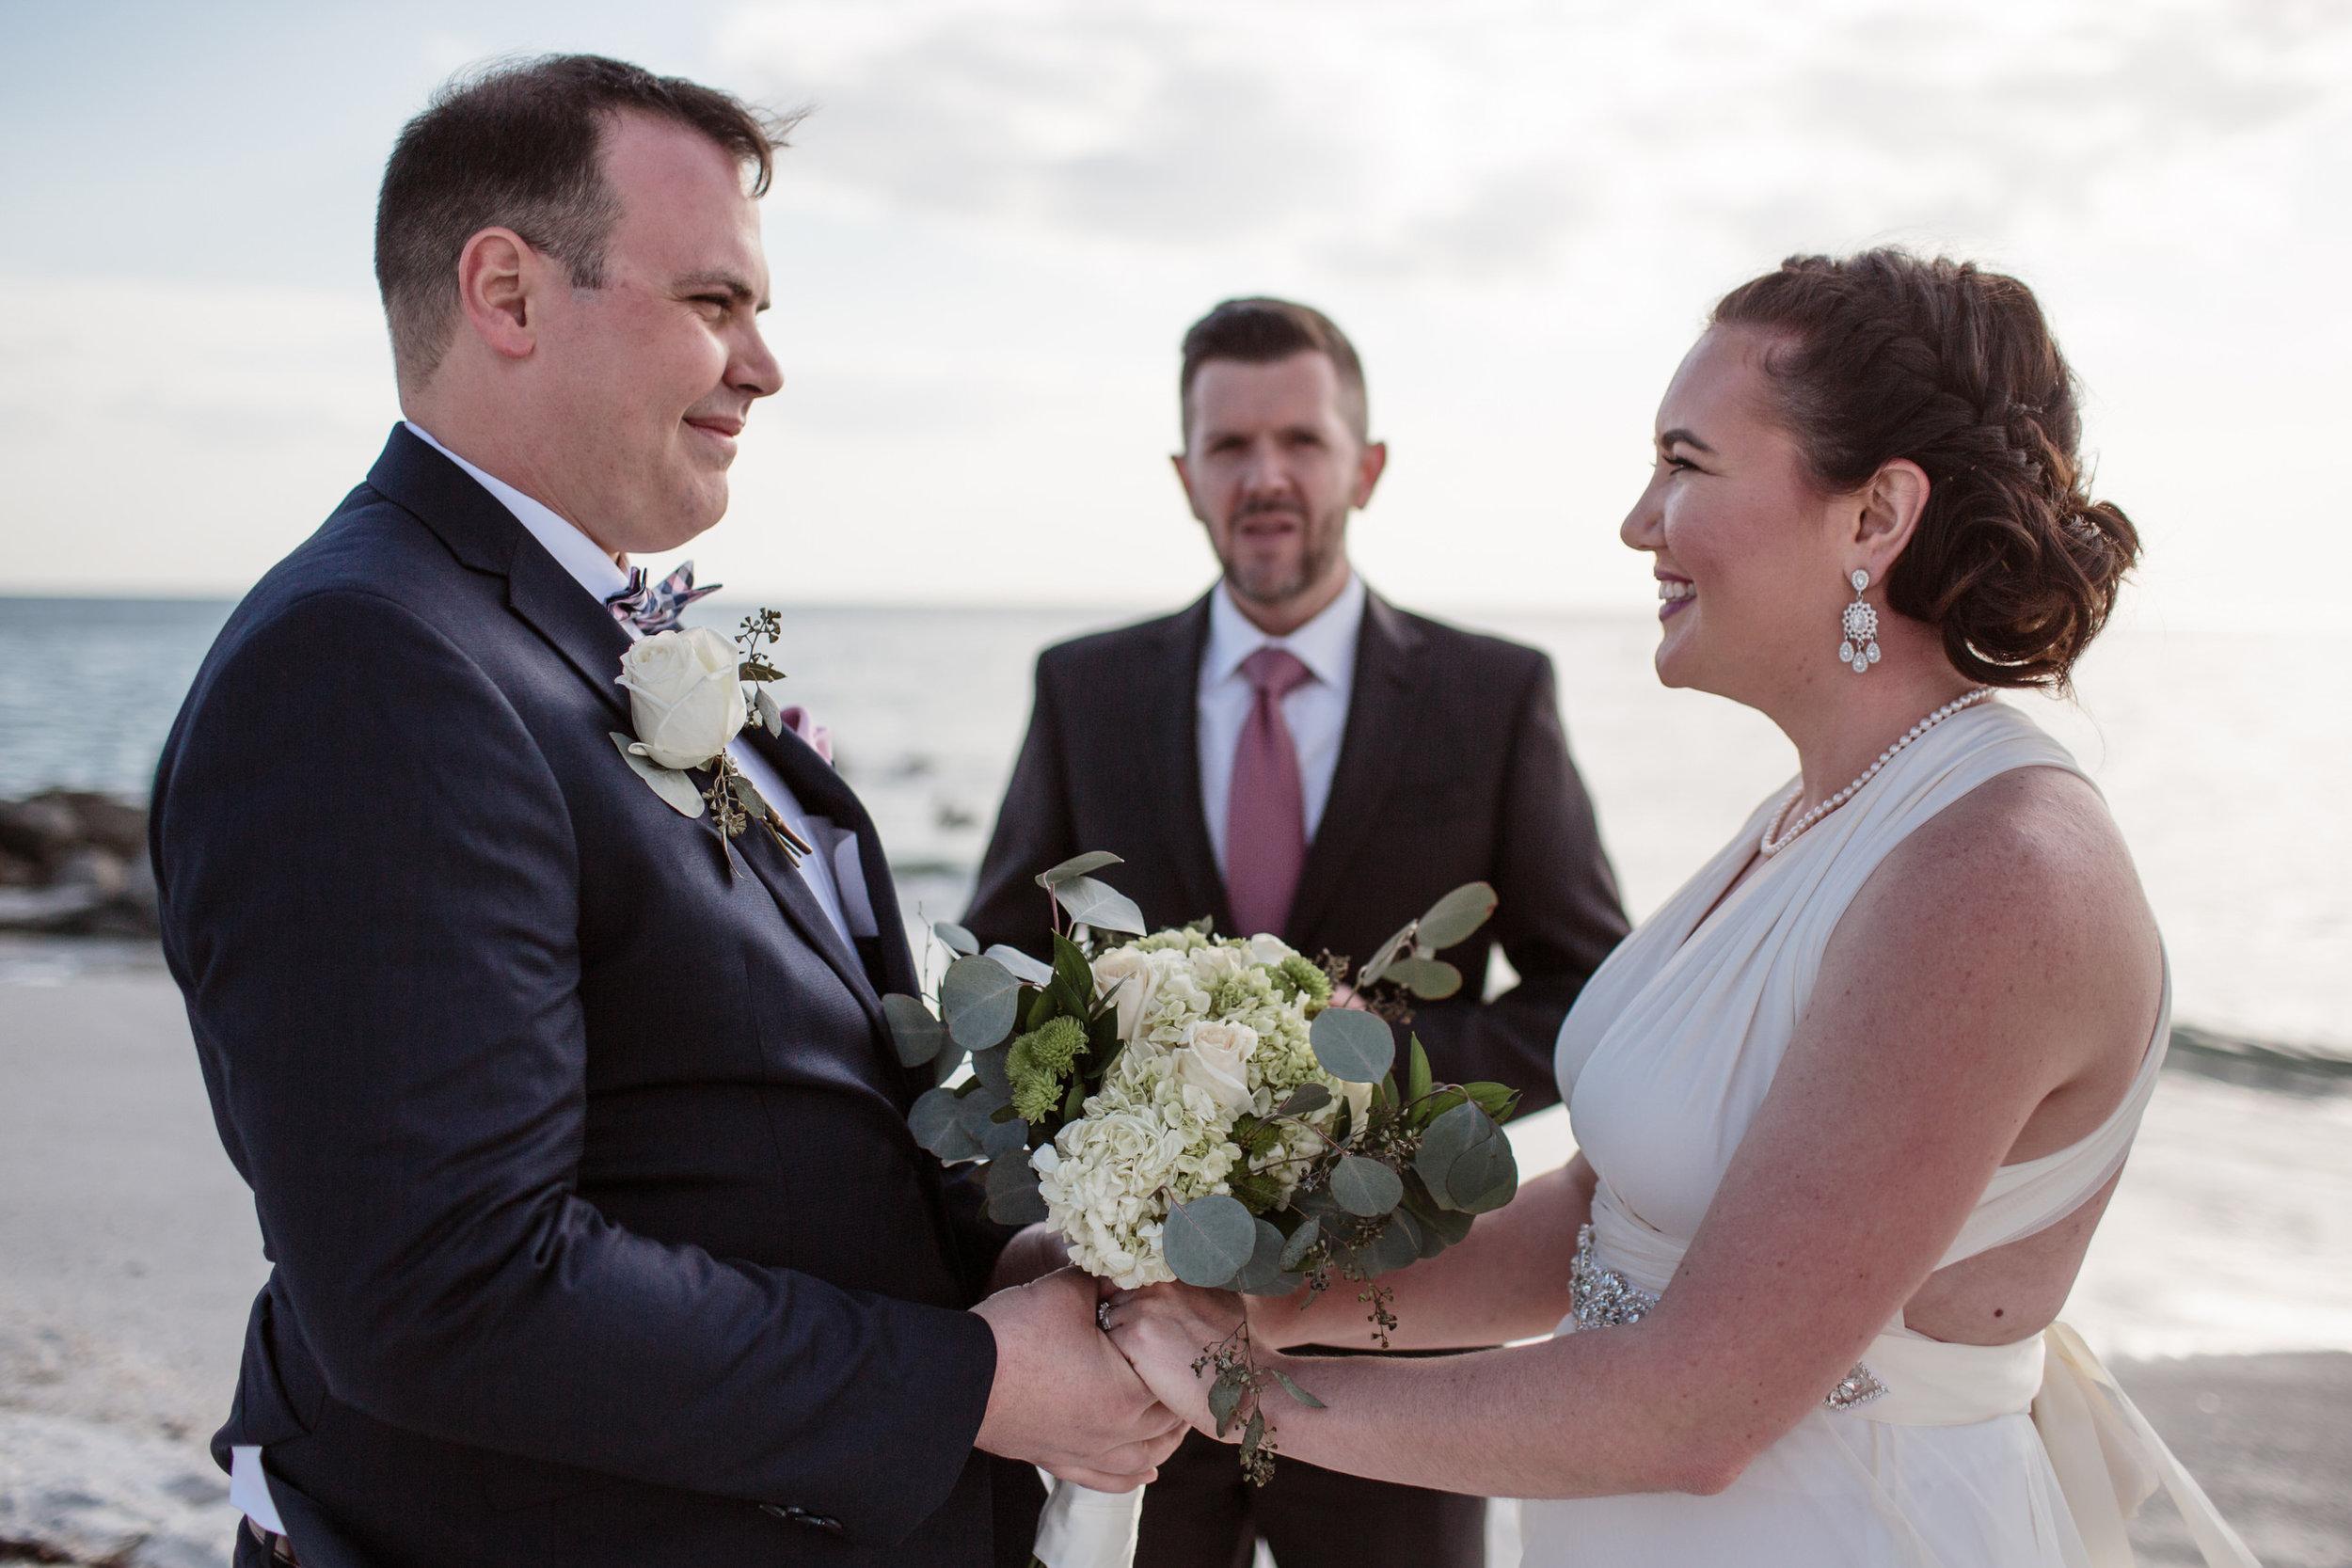 Beltran_Treasure_Island_Elopement_Tampa_Wedding_020-1.jpg